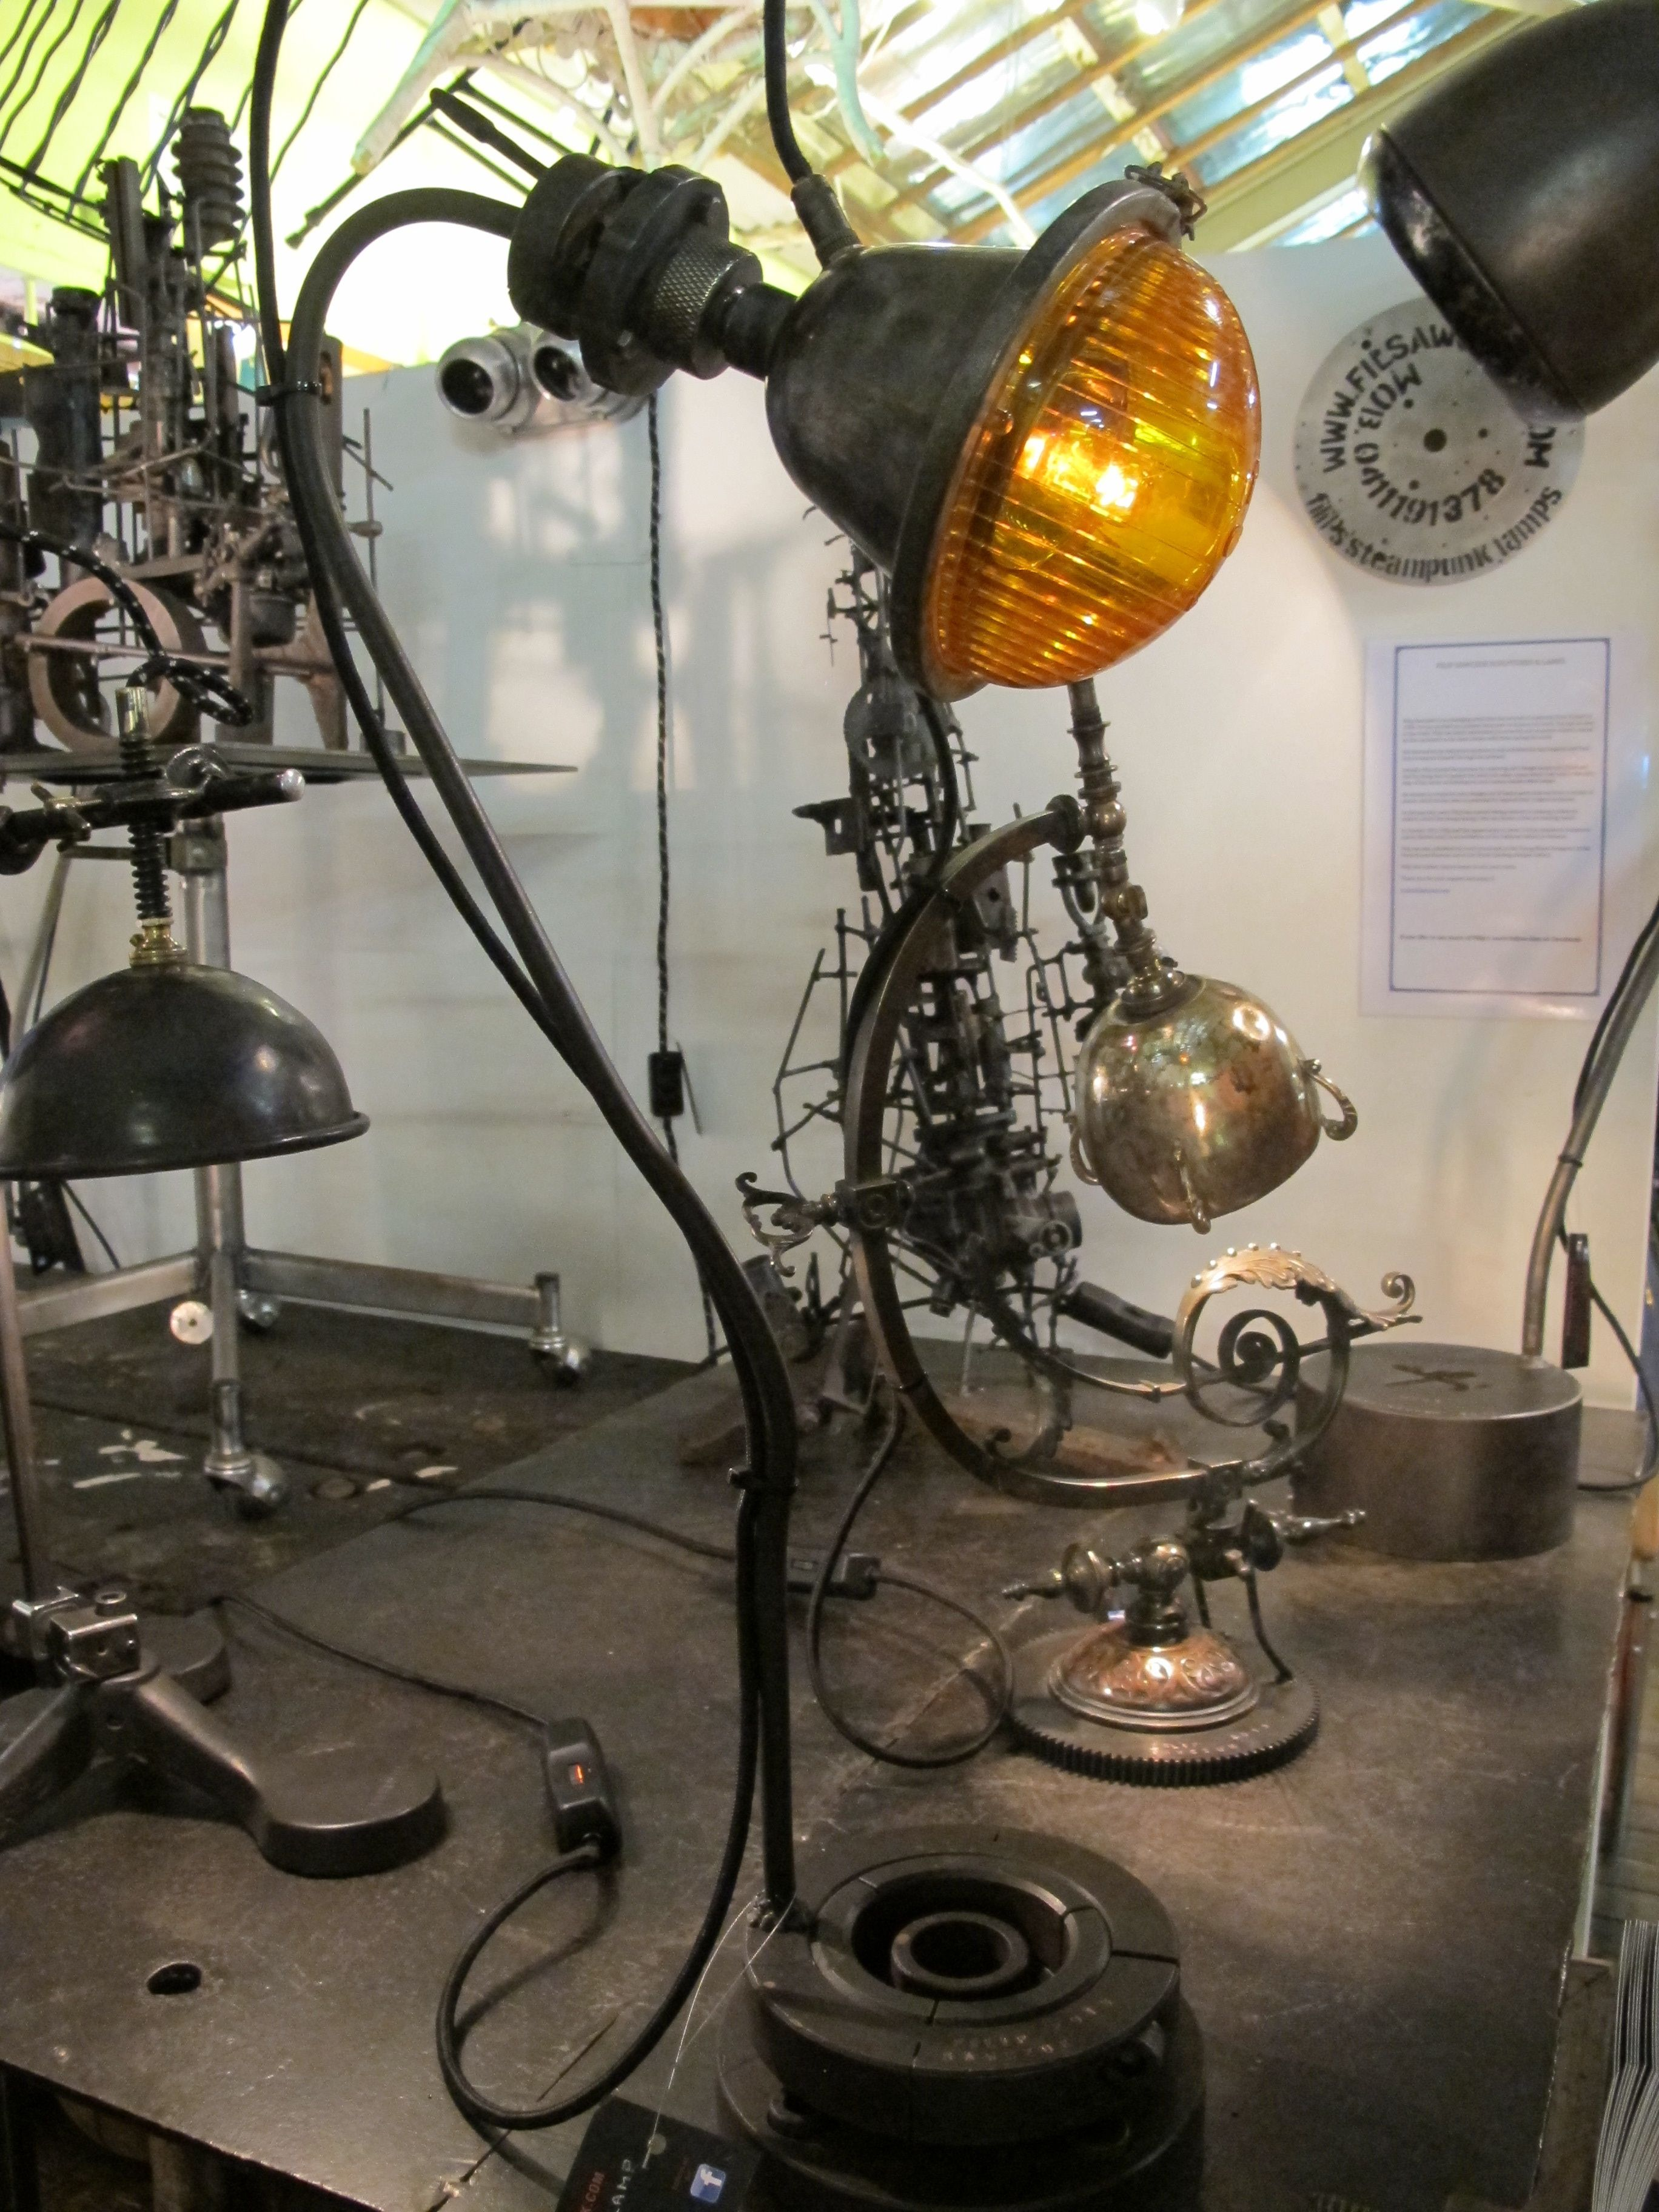 Artist made steam punk lamps-by Filip Sawchuk.